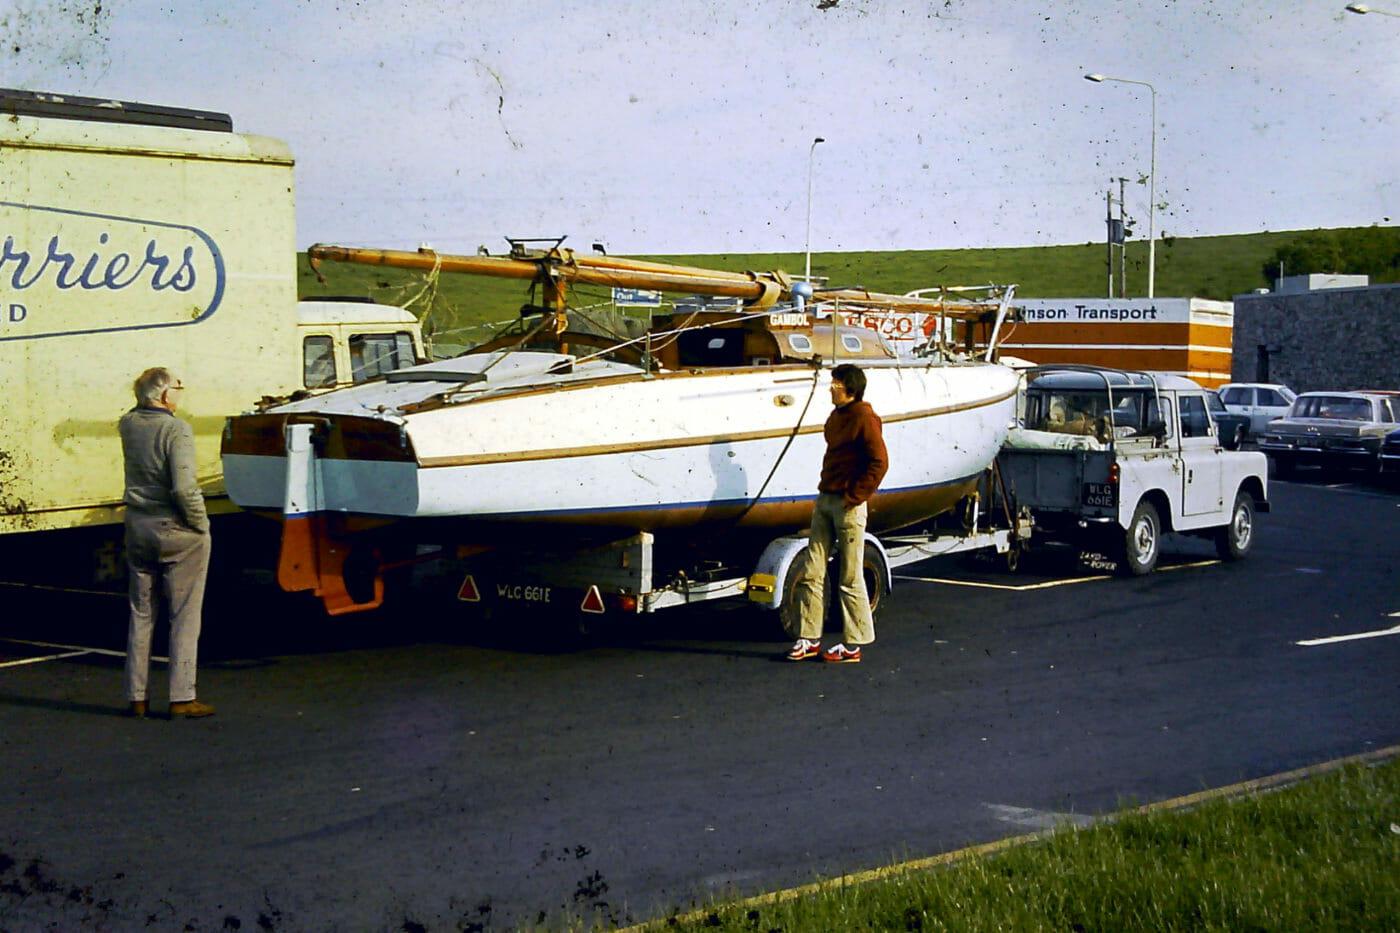 A17 Gambol Cyril John Harpley Circa 1976